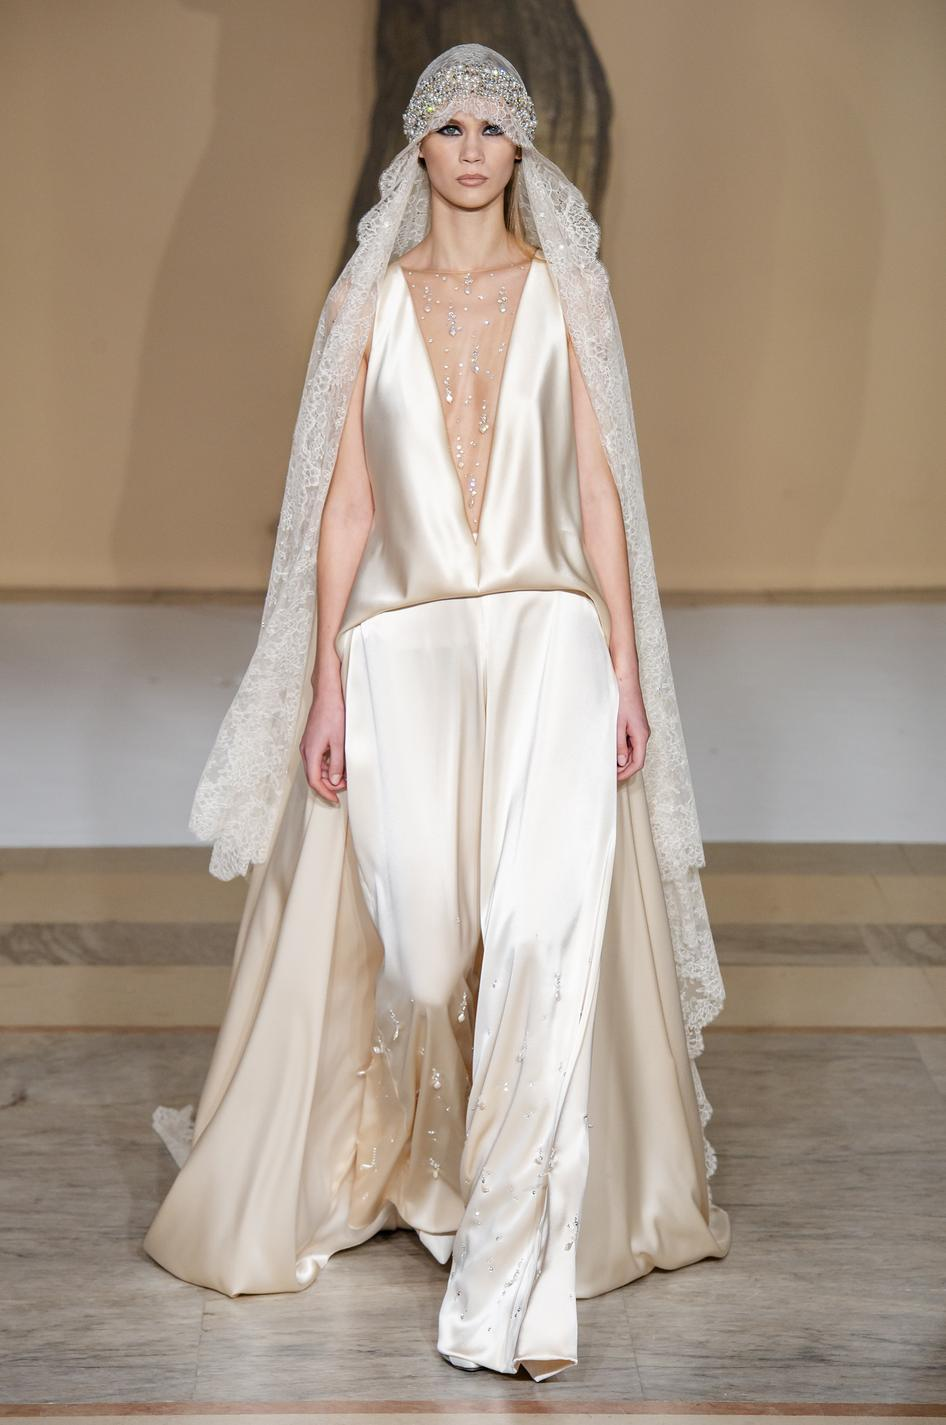 Robe de mariee 2019 haute couture